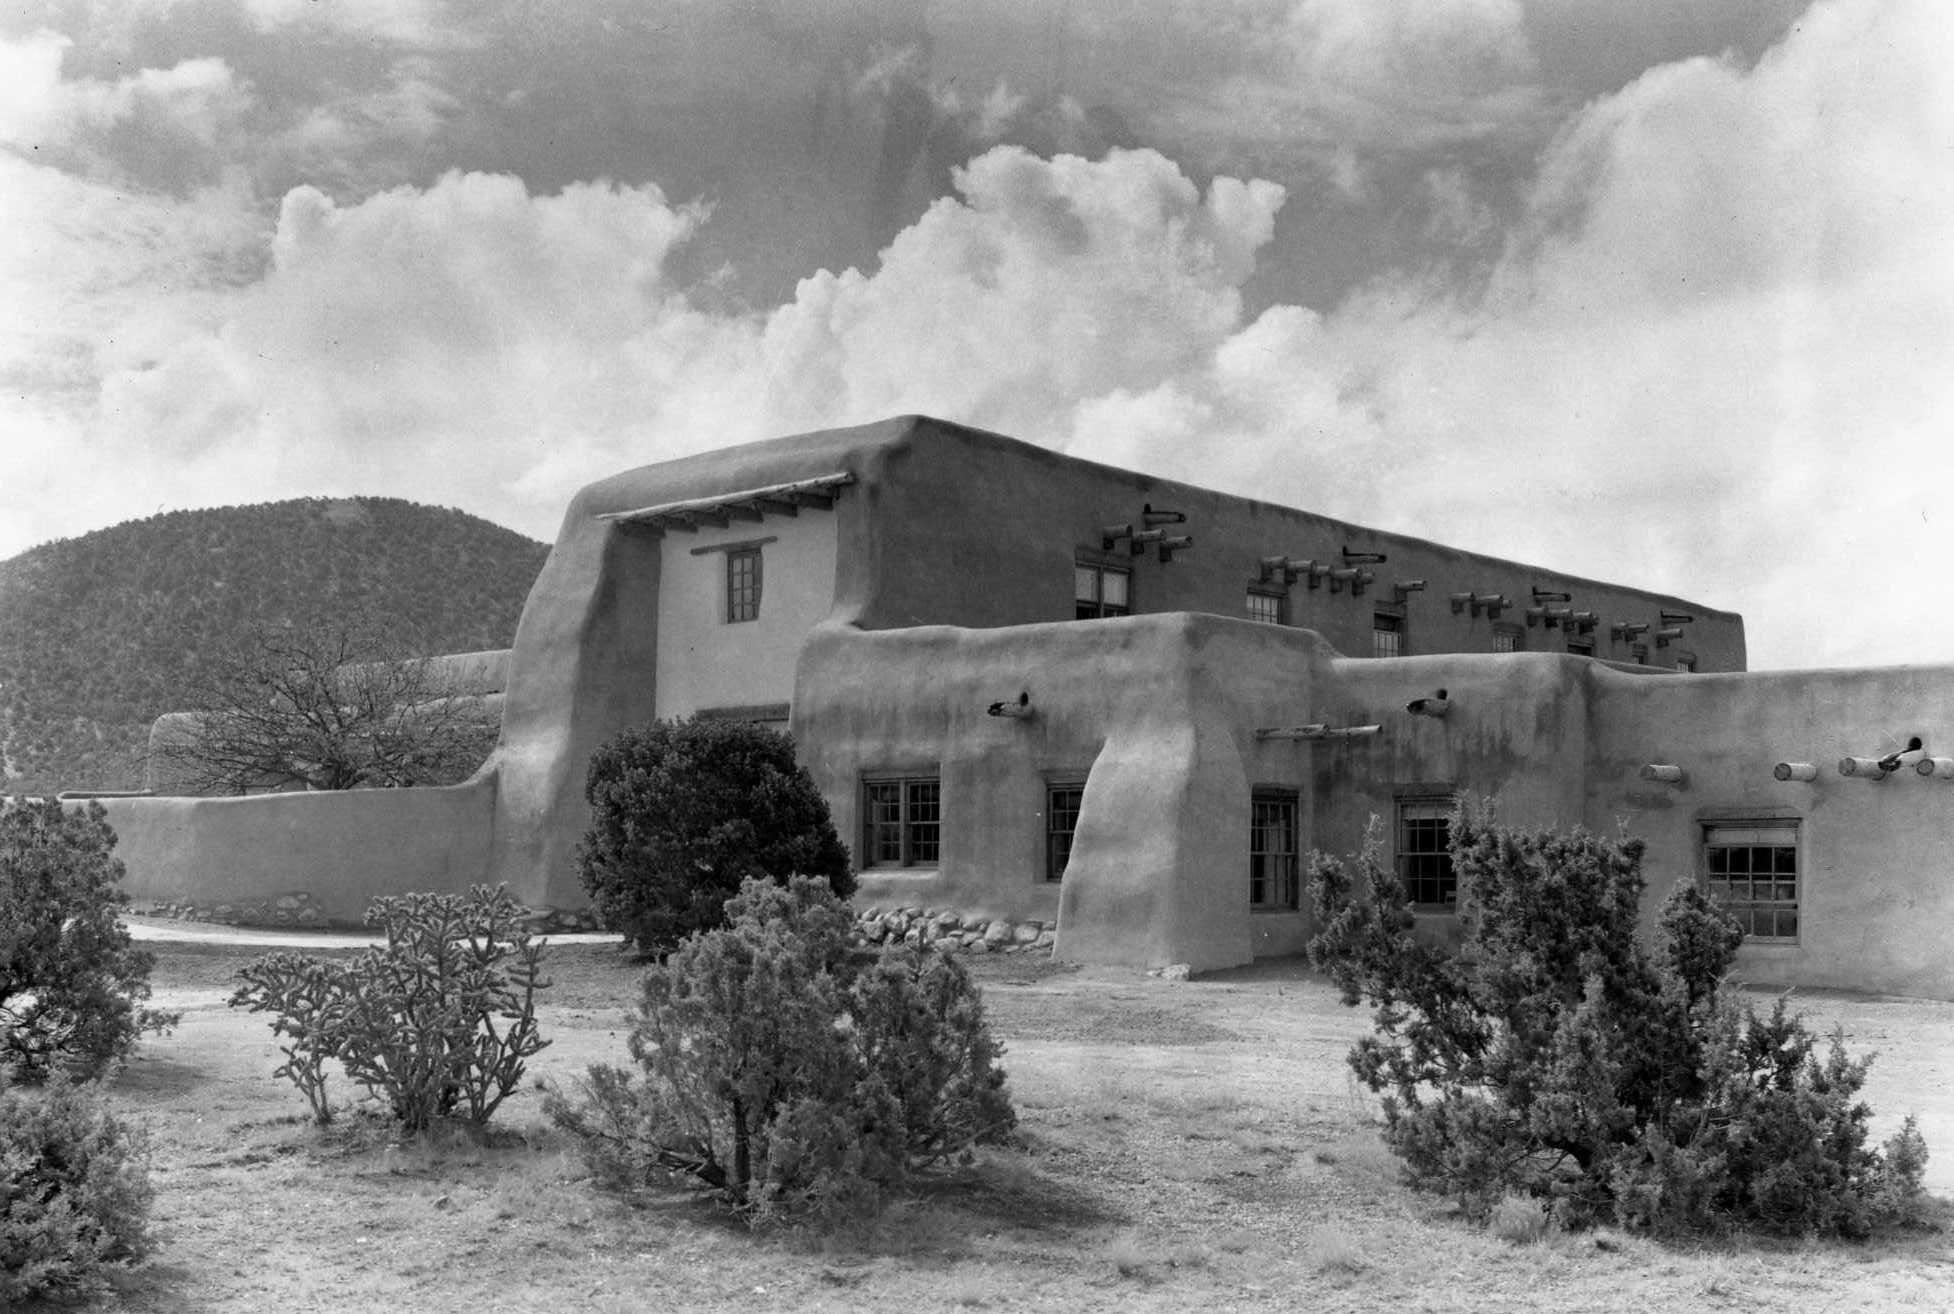 Old Santa Fe Trail Building, National Park Service